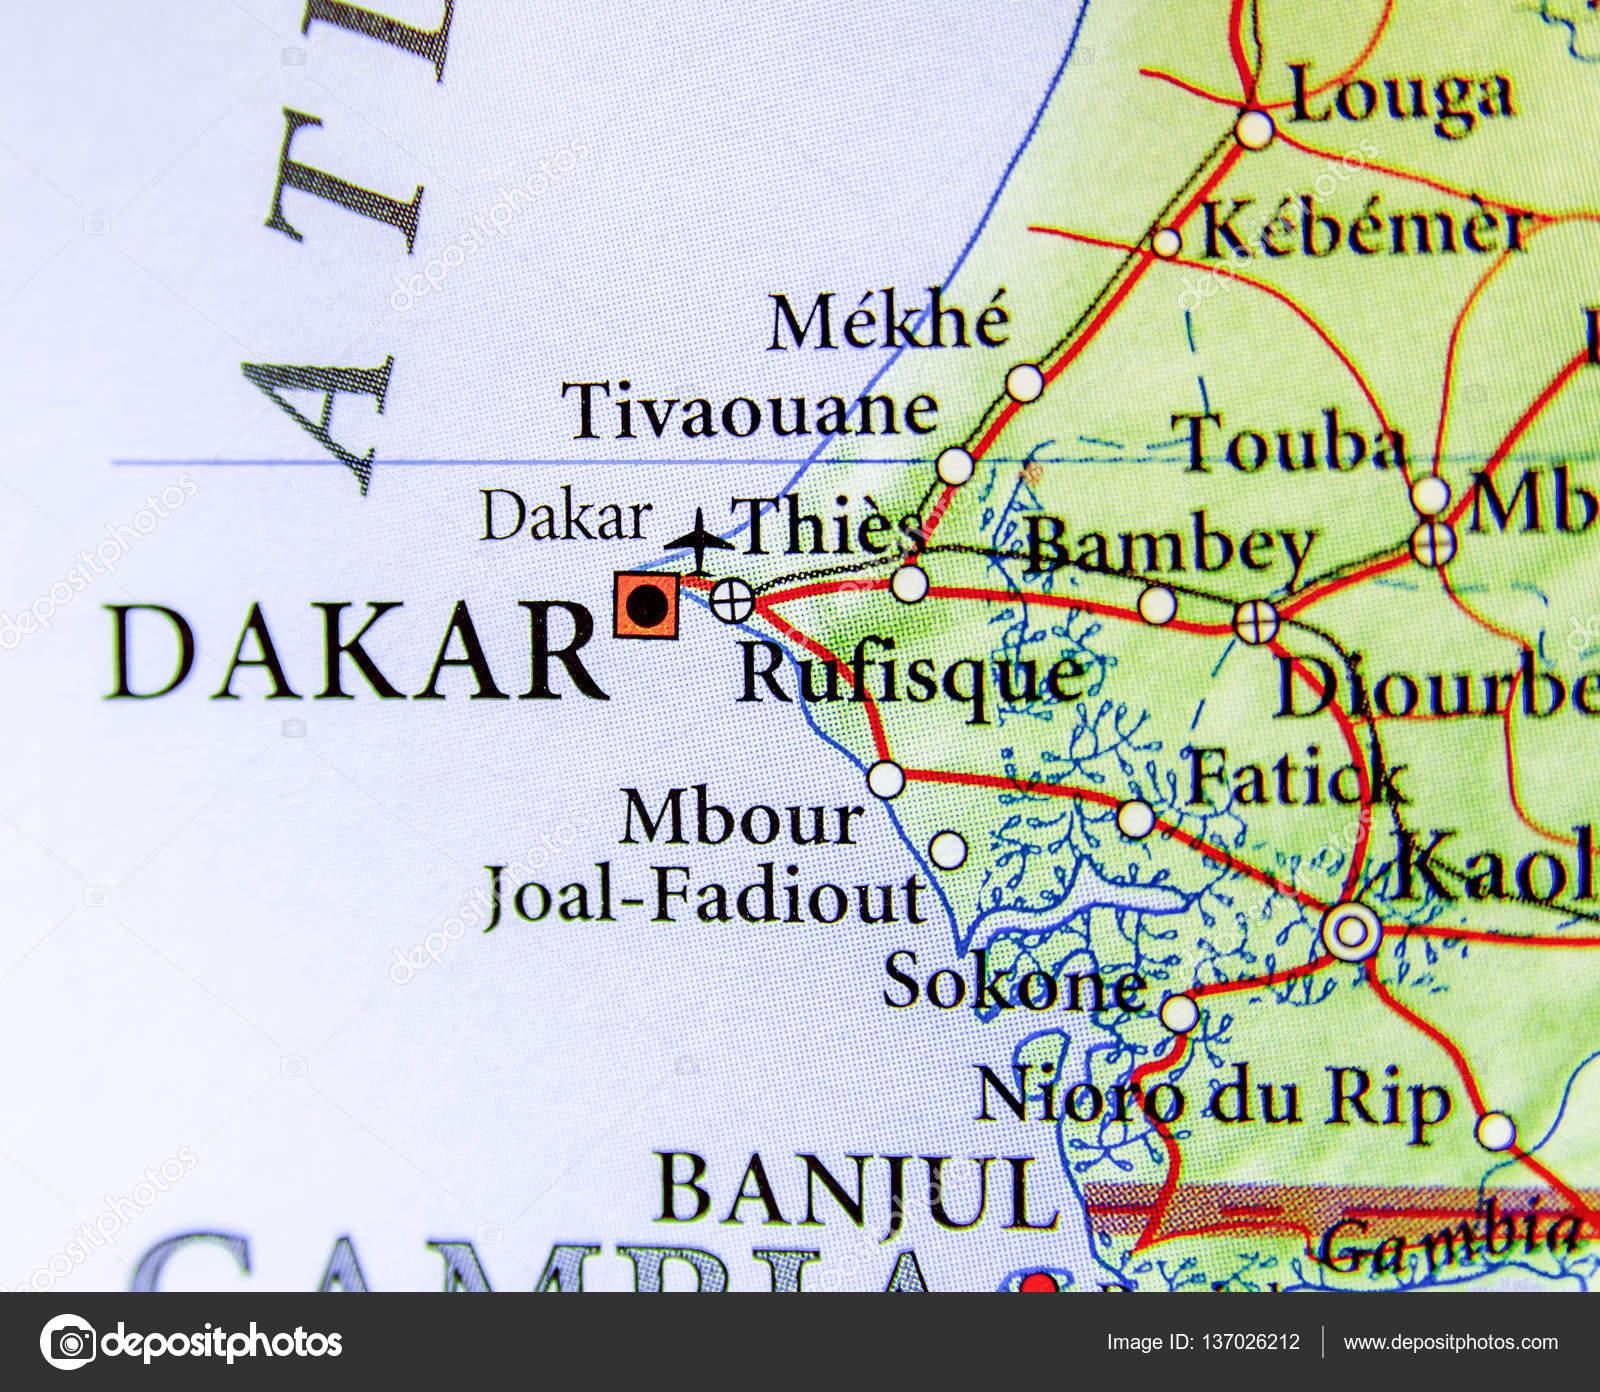 Geographic map of Senegal with capital city Dakar — Stock ... on ramallah city map, limassol city map, ibadan city map, bulawayo city map, apia city map, aleppo city map, fortaleza city map, libya city map, cameroon city map, gwangju city map, kumasi city map, accra city map, cotonou city map, goteborg city map, murmansk city map, kaliningrad city map, malabo city map, zambia city map, dushanbe city map,